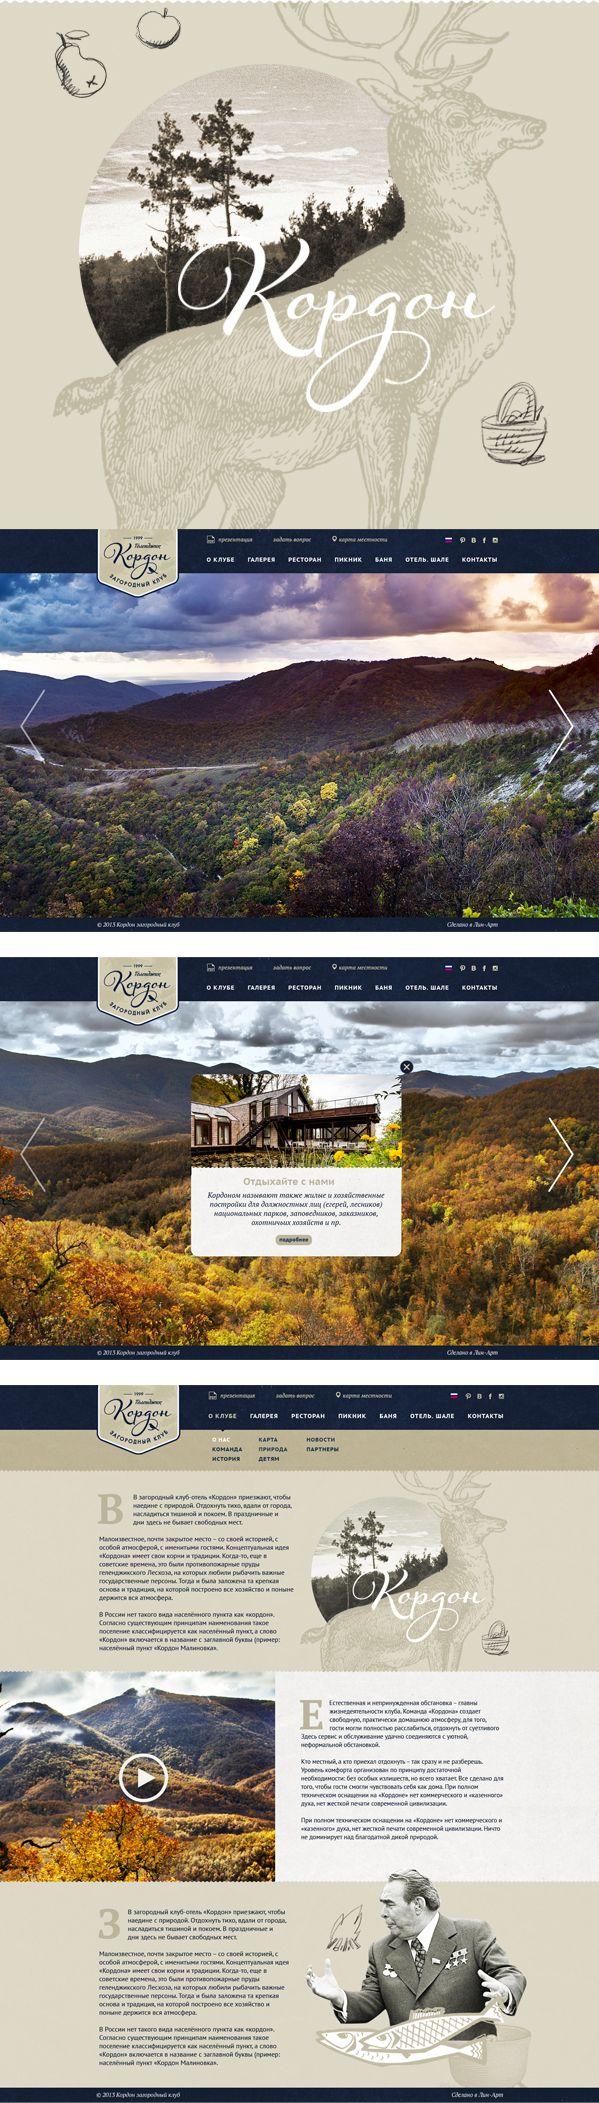 Web design for Country Club Kordon